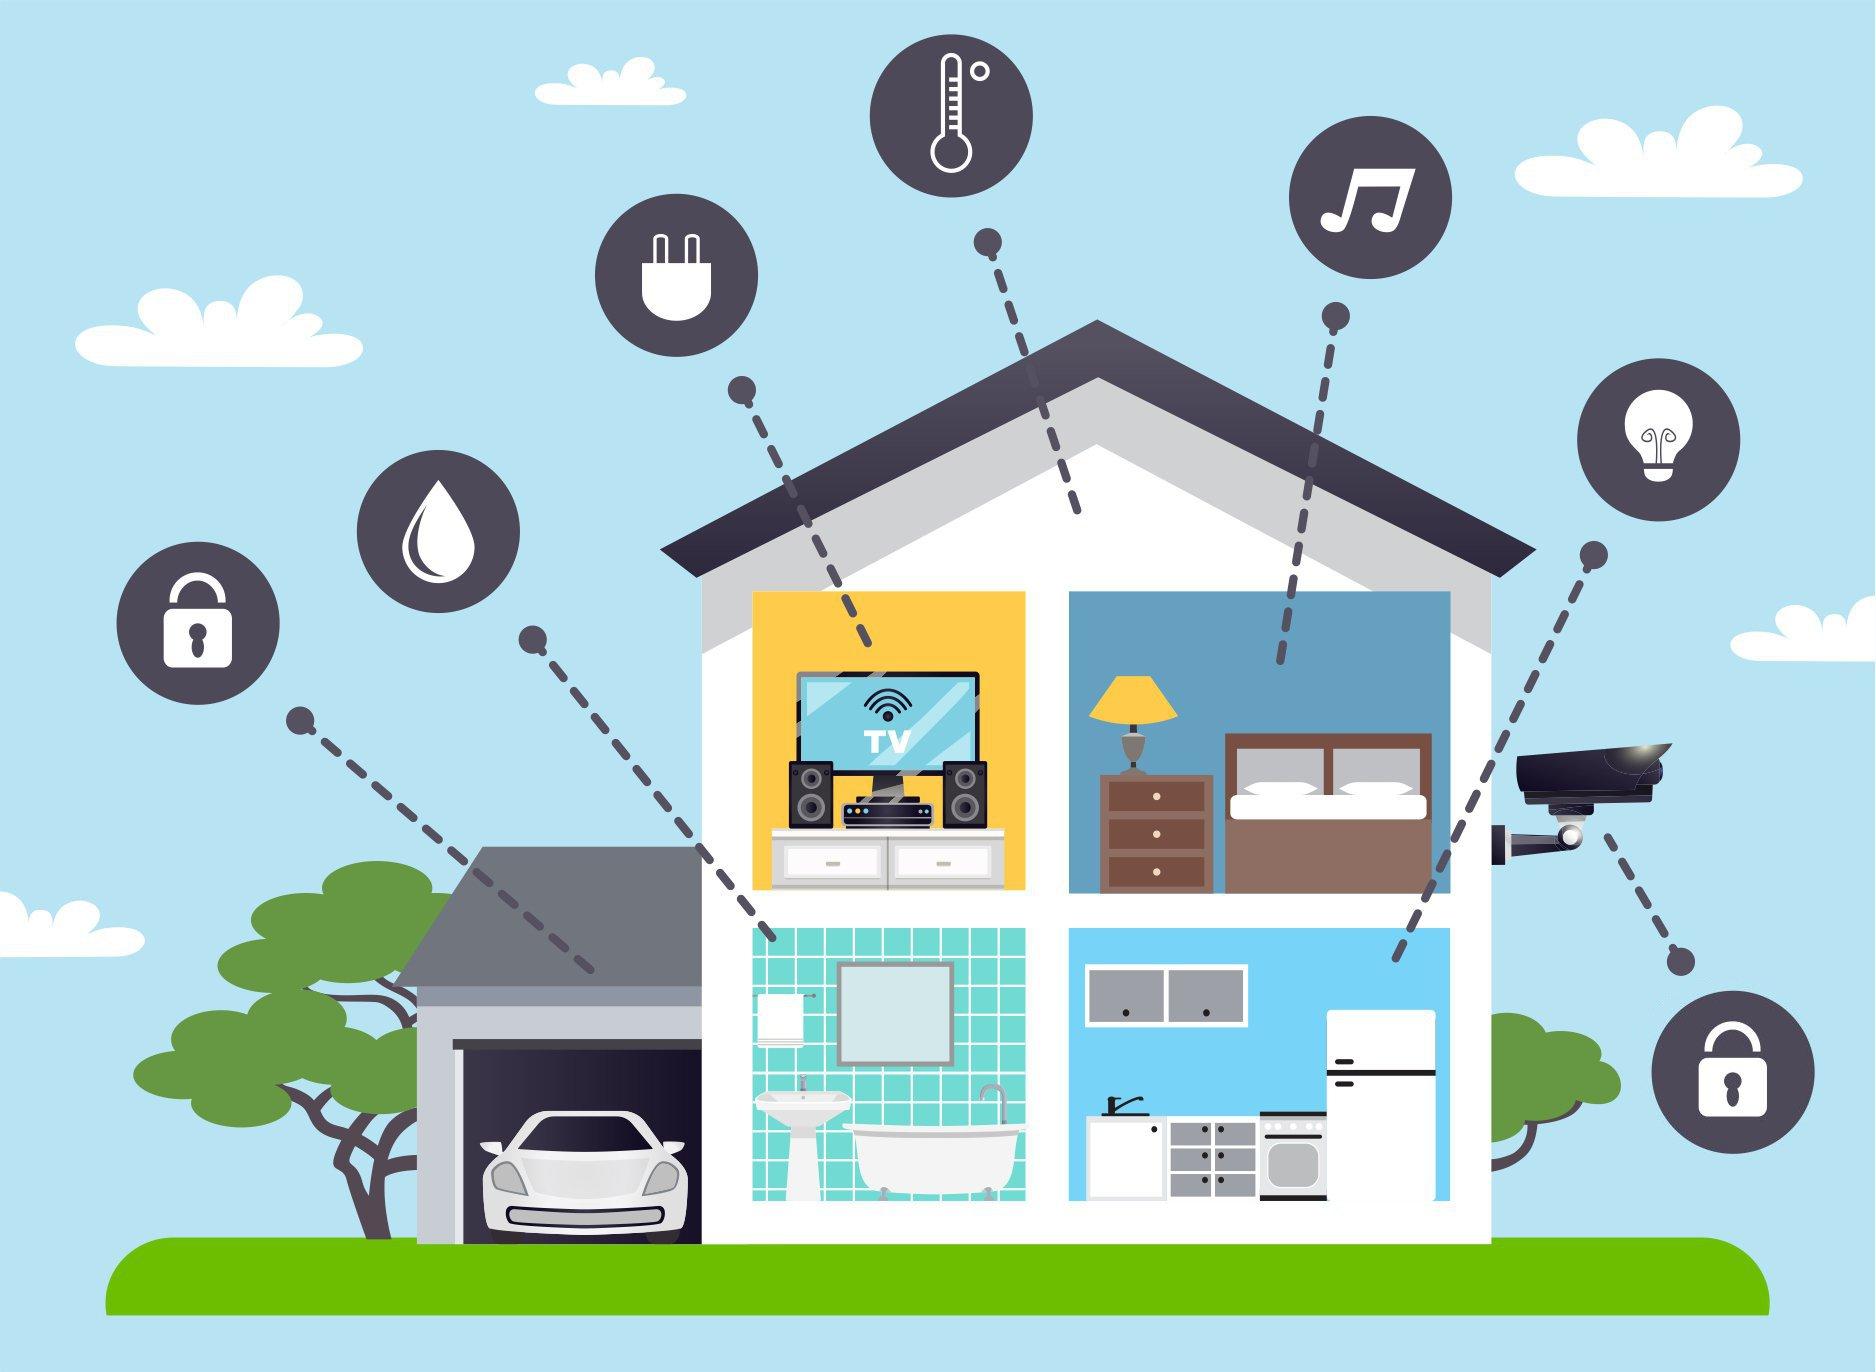 elektroinstalace, elektronické systémy, chytrý dům